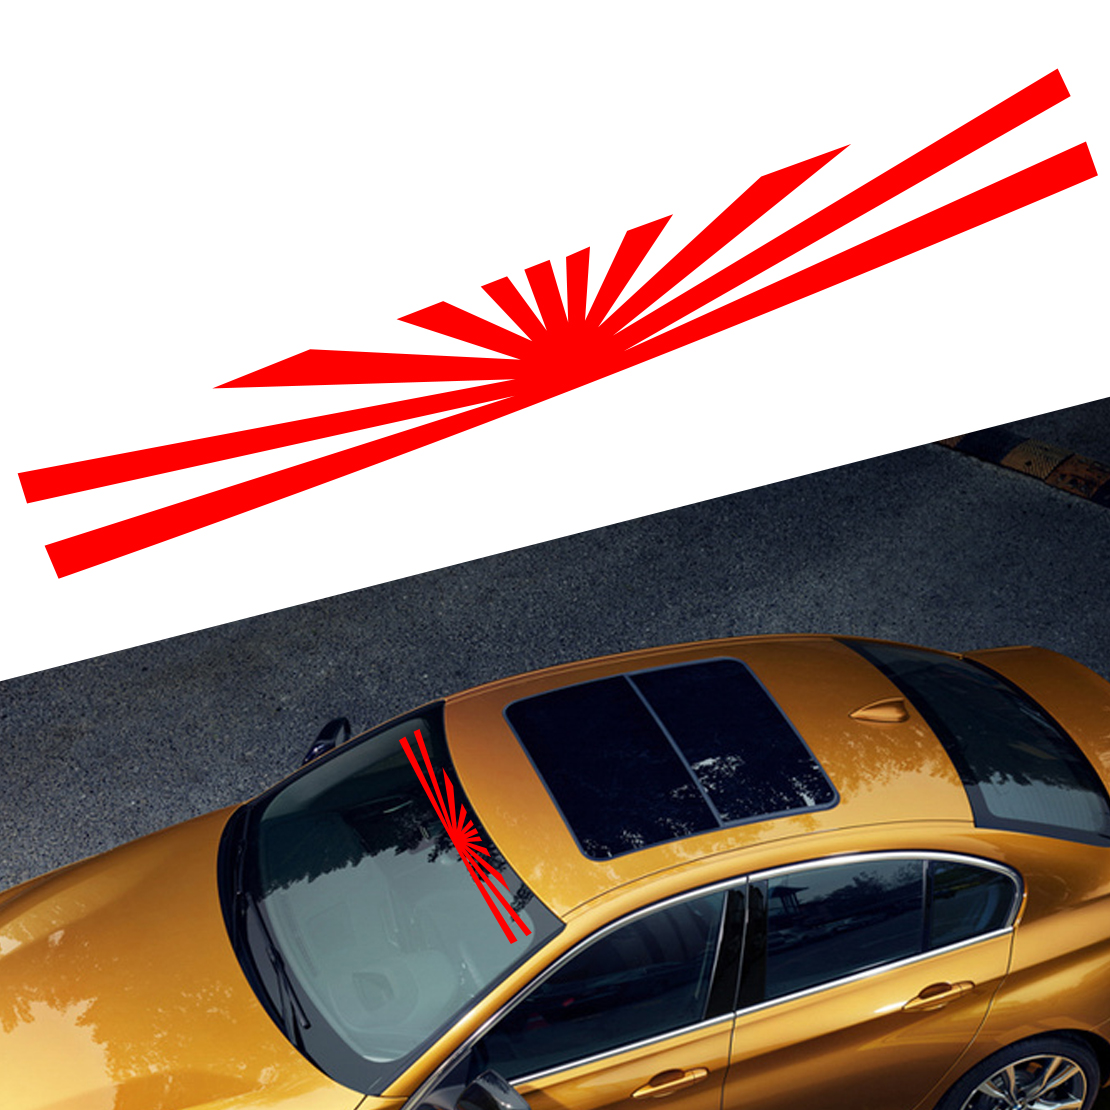 1.5M Car Rising Sun Japan Daily Low Strip Printed Windshield Vinyl Sticker Decal